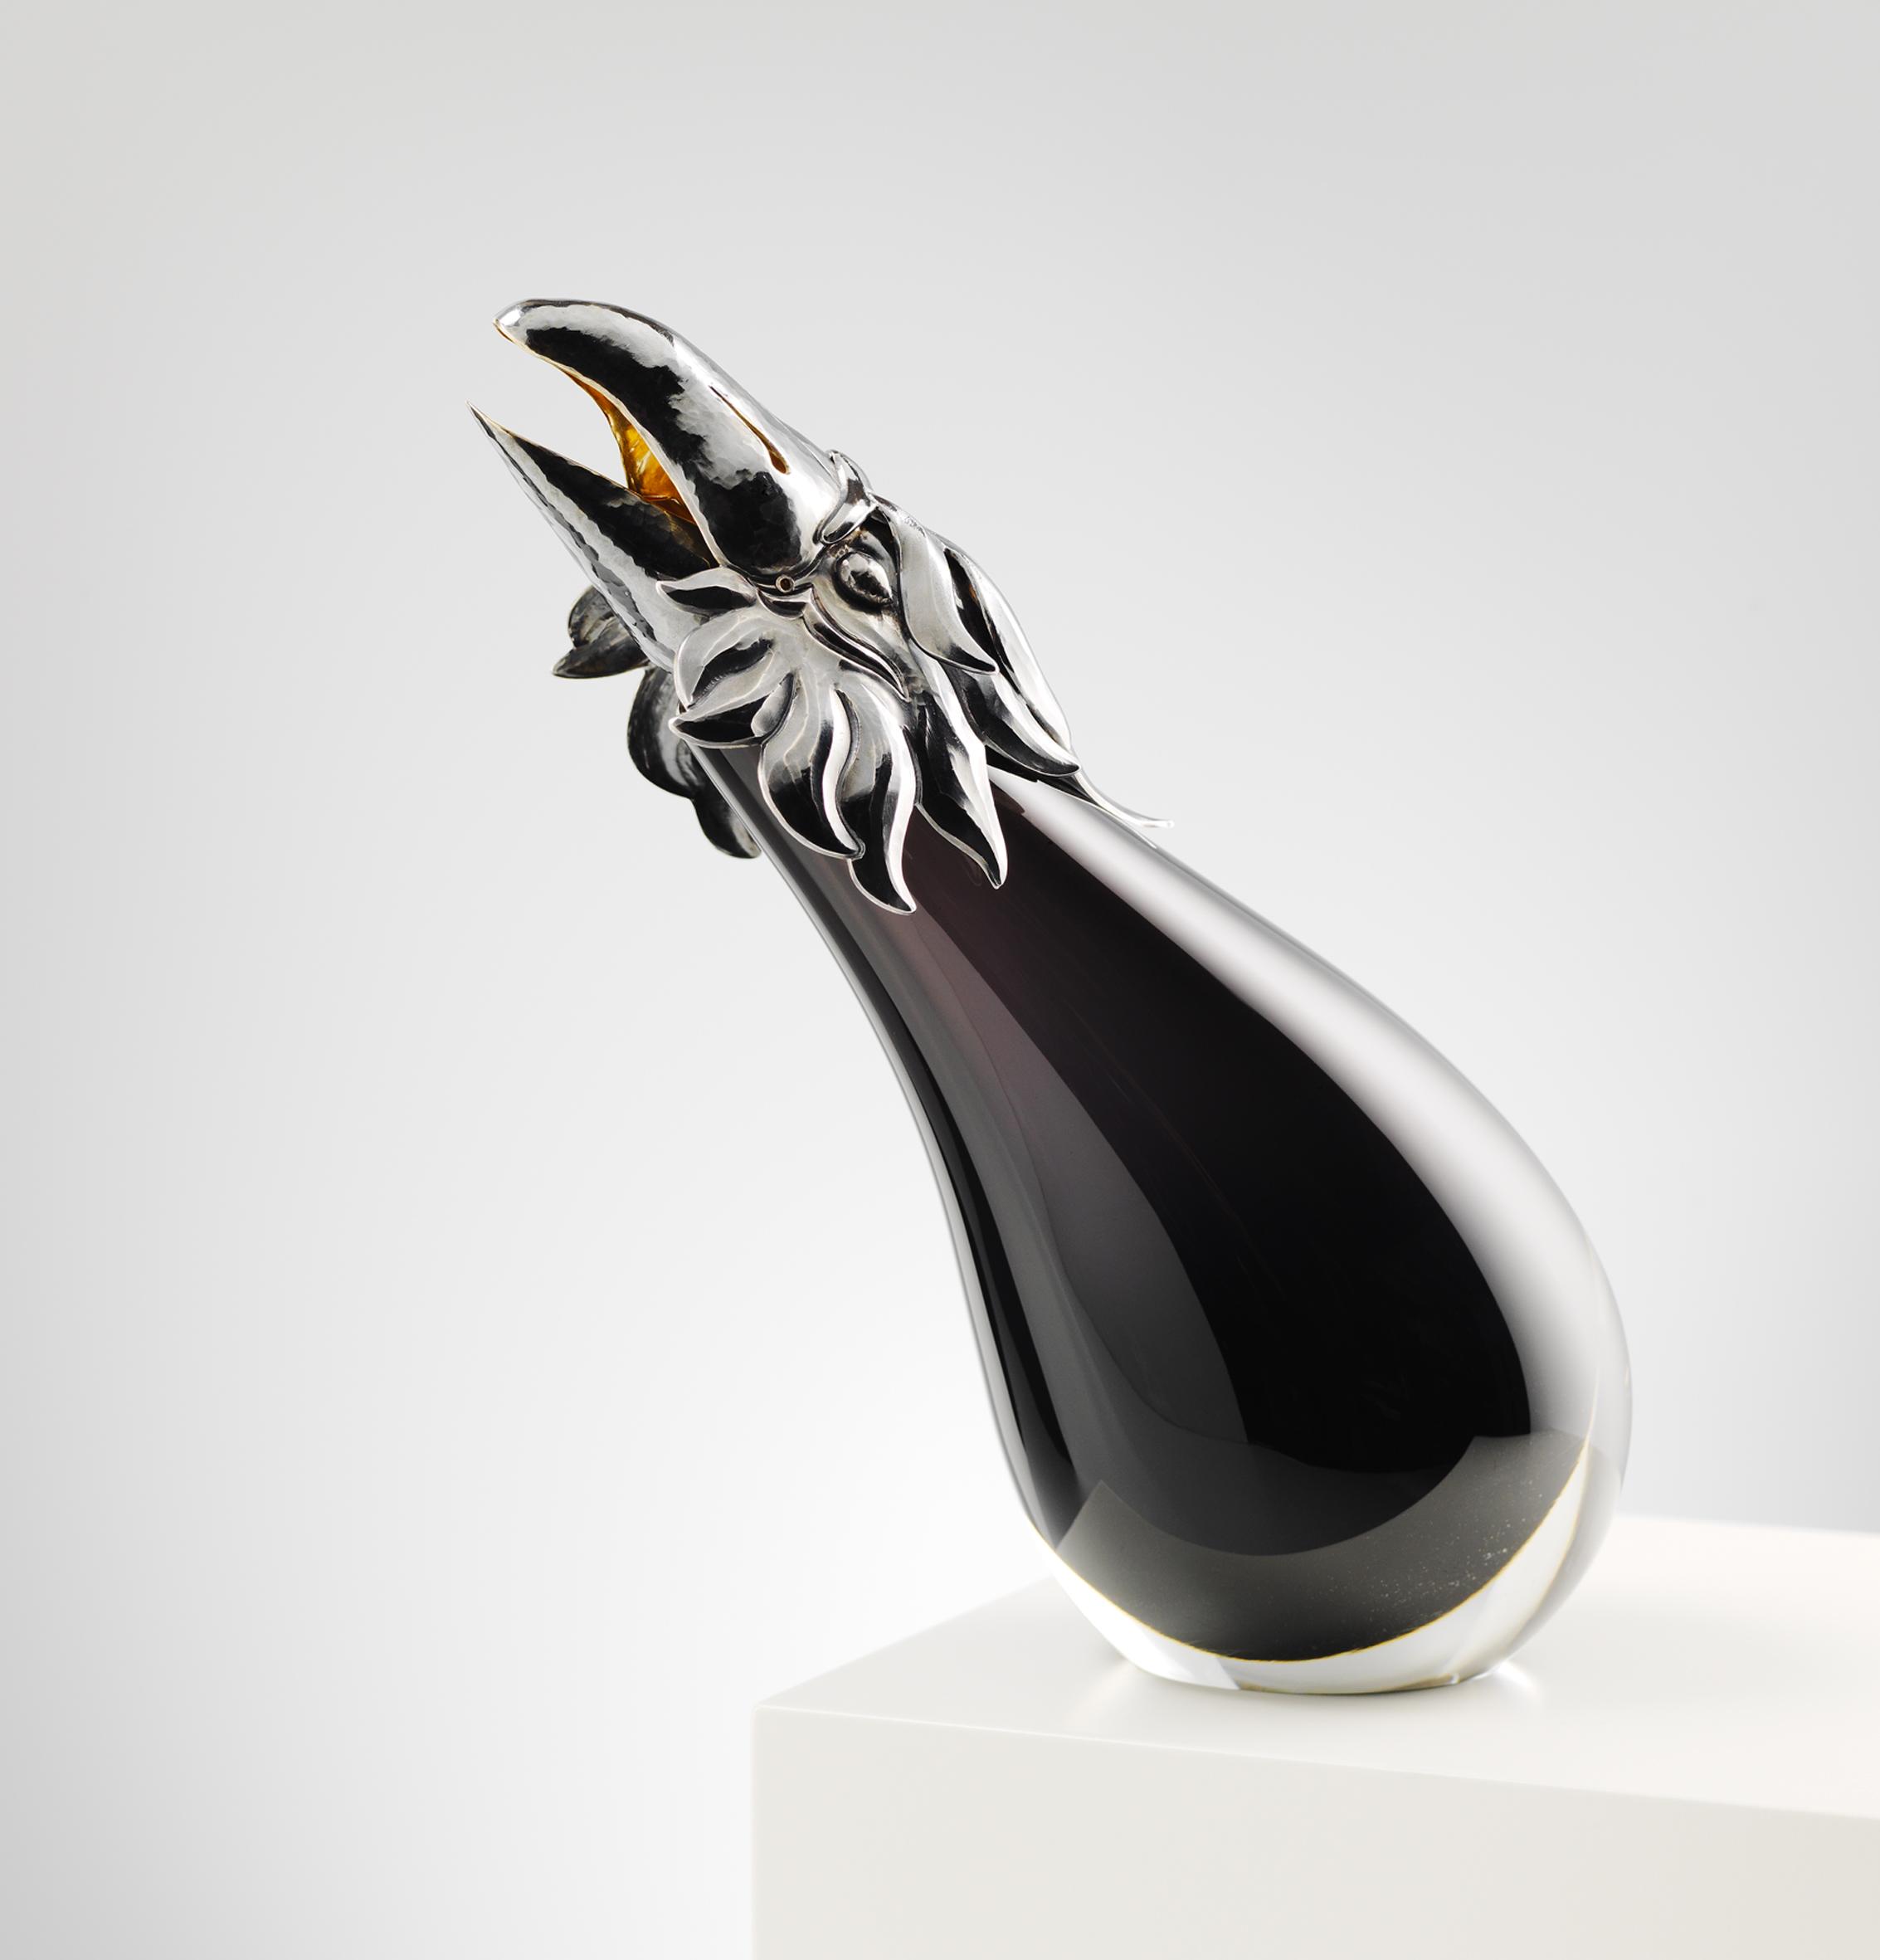 Raven Pourer